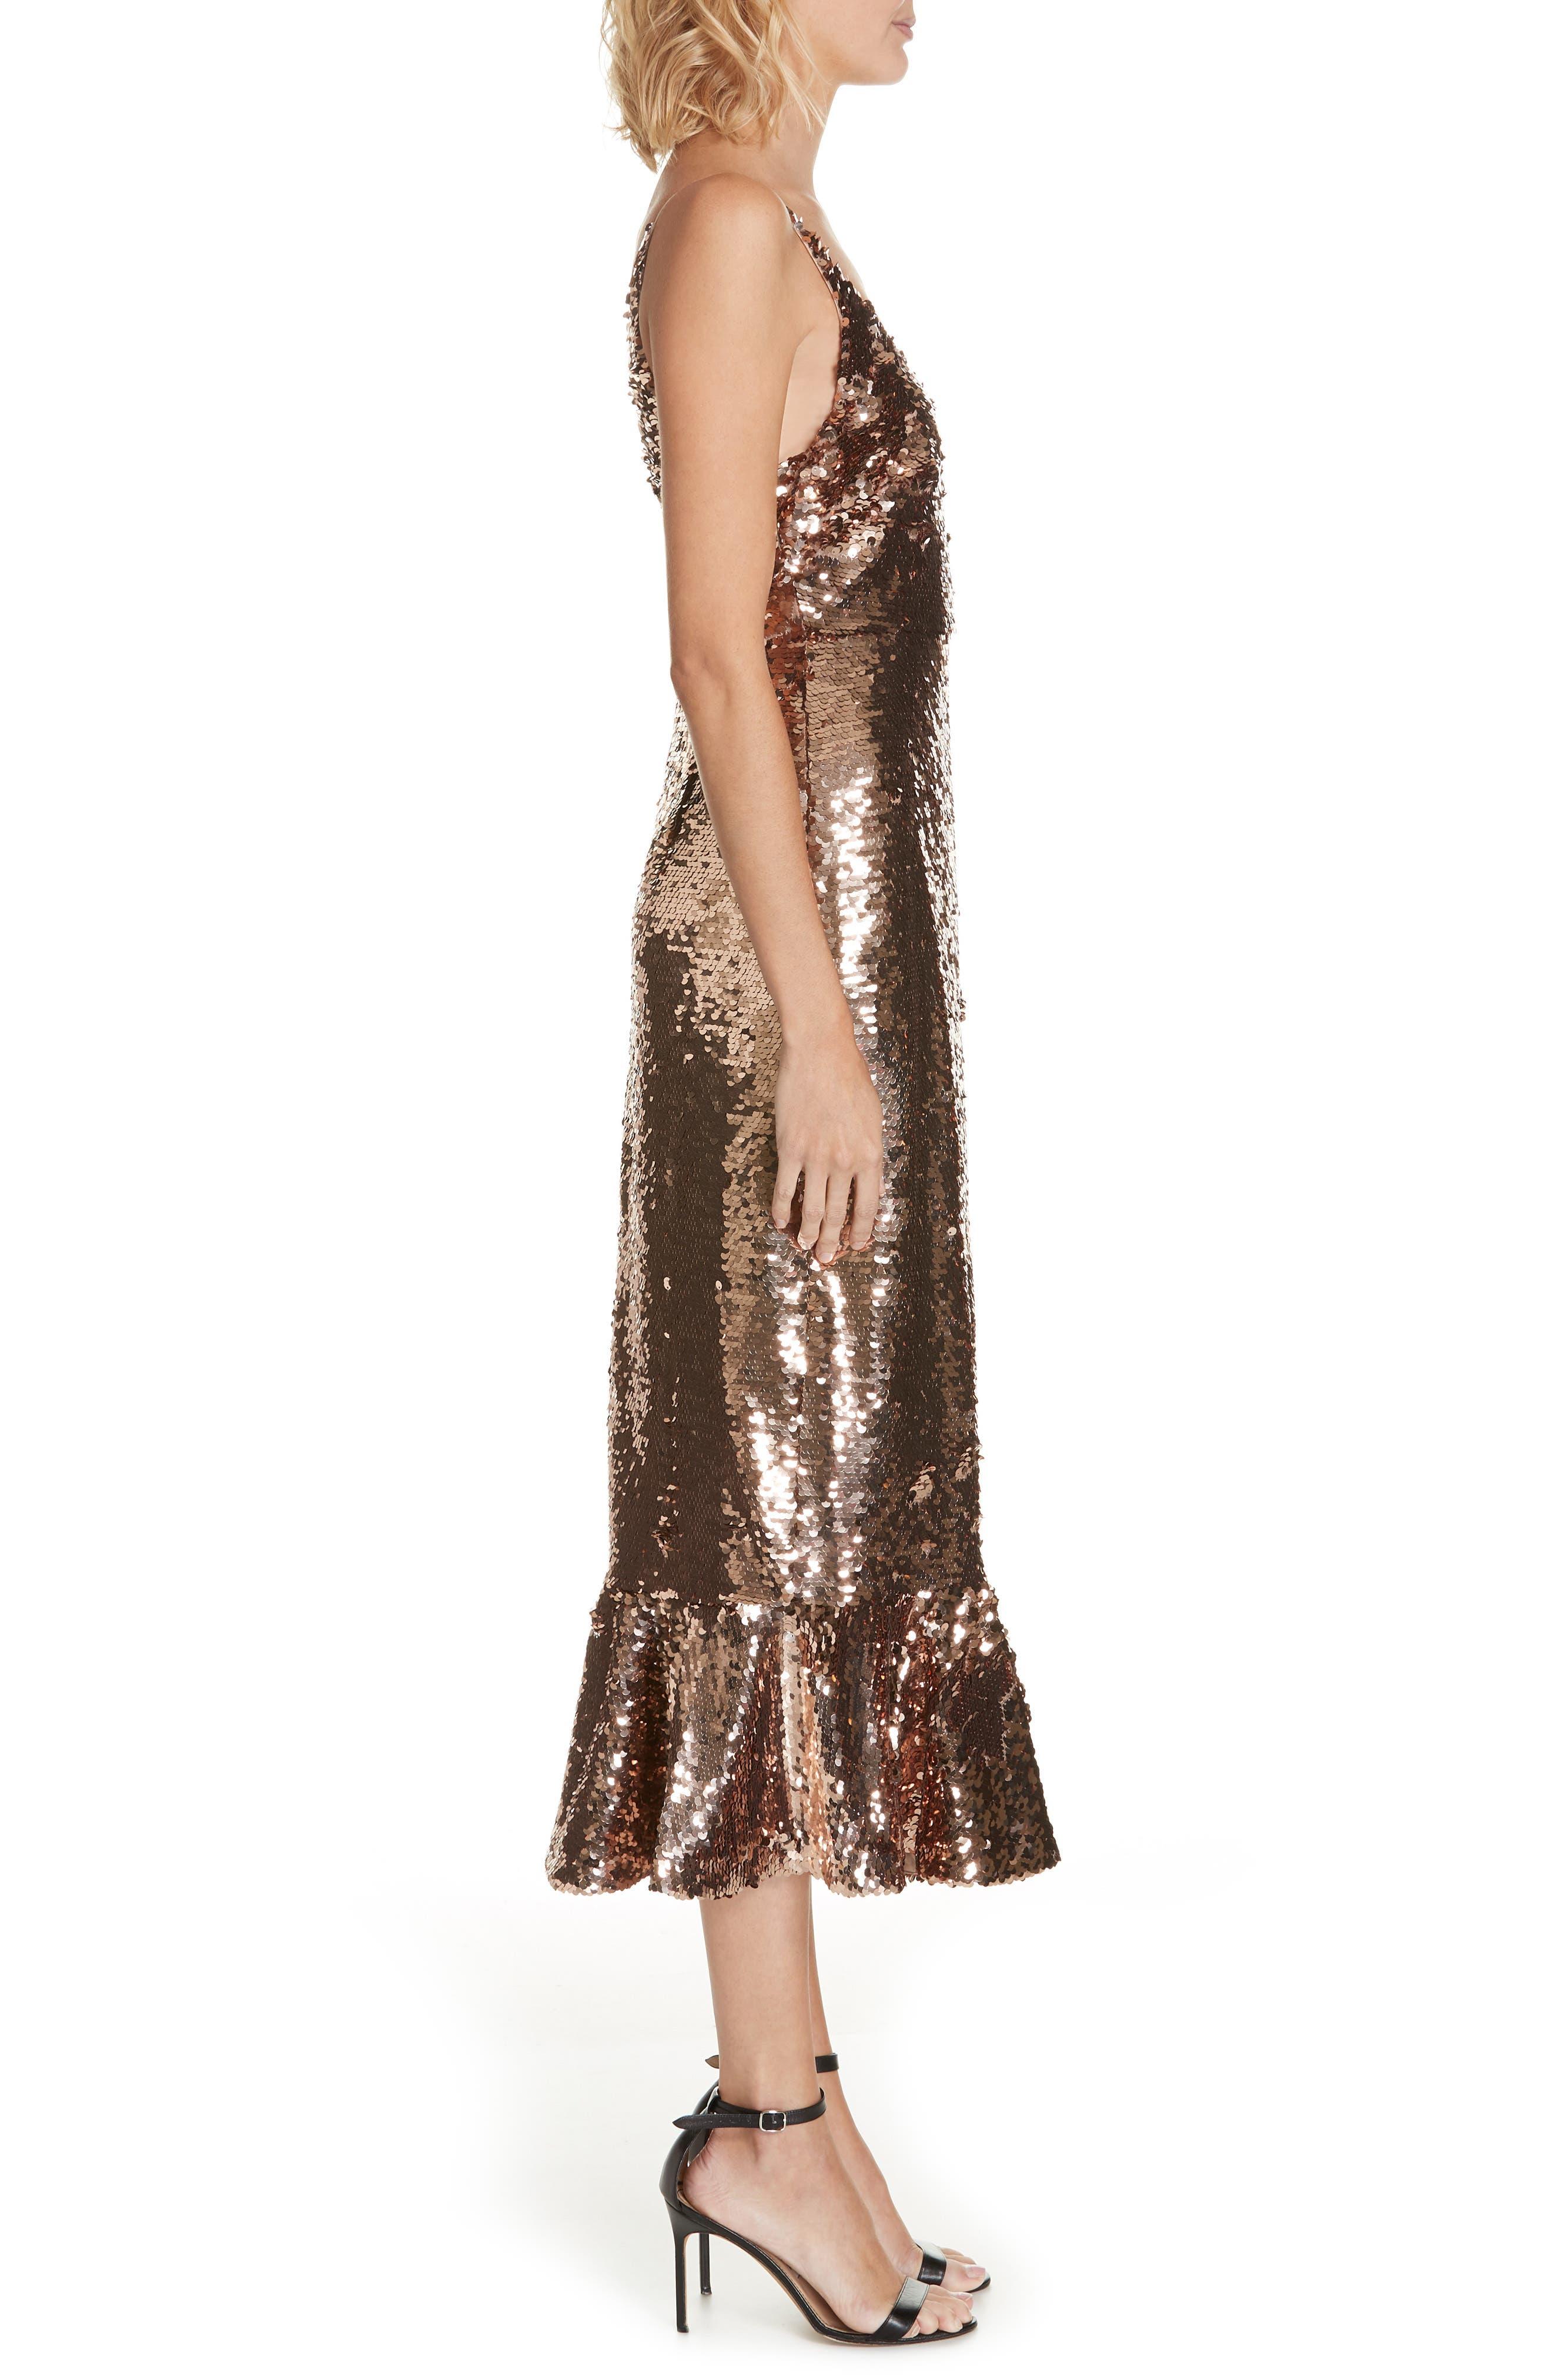 SALONI, Aidan Sequin Ruffle Hem Midi Dress, Alternate thumbnail 4, color, BRONZE